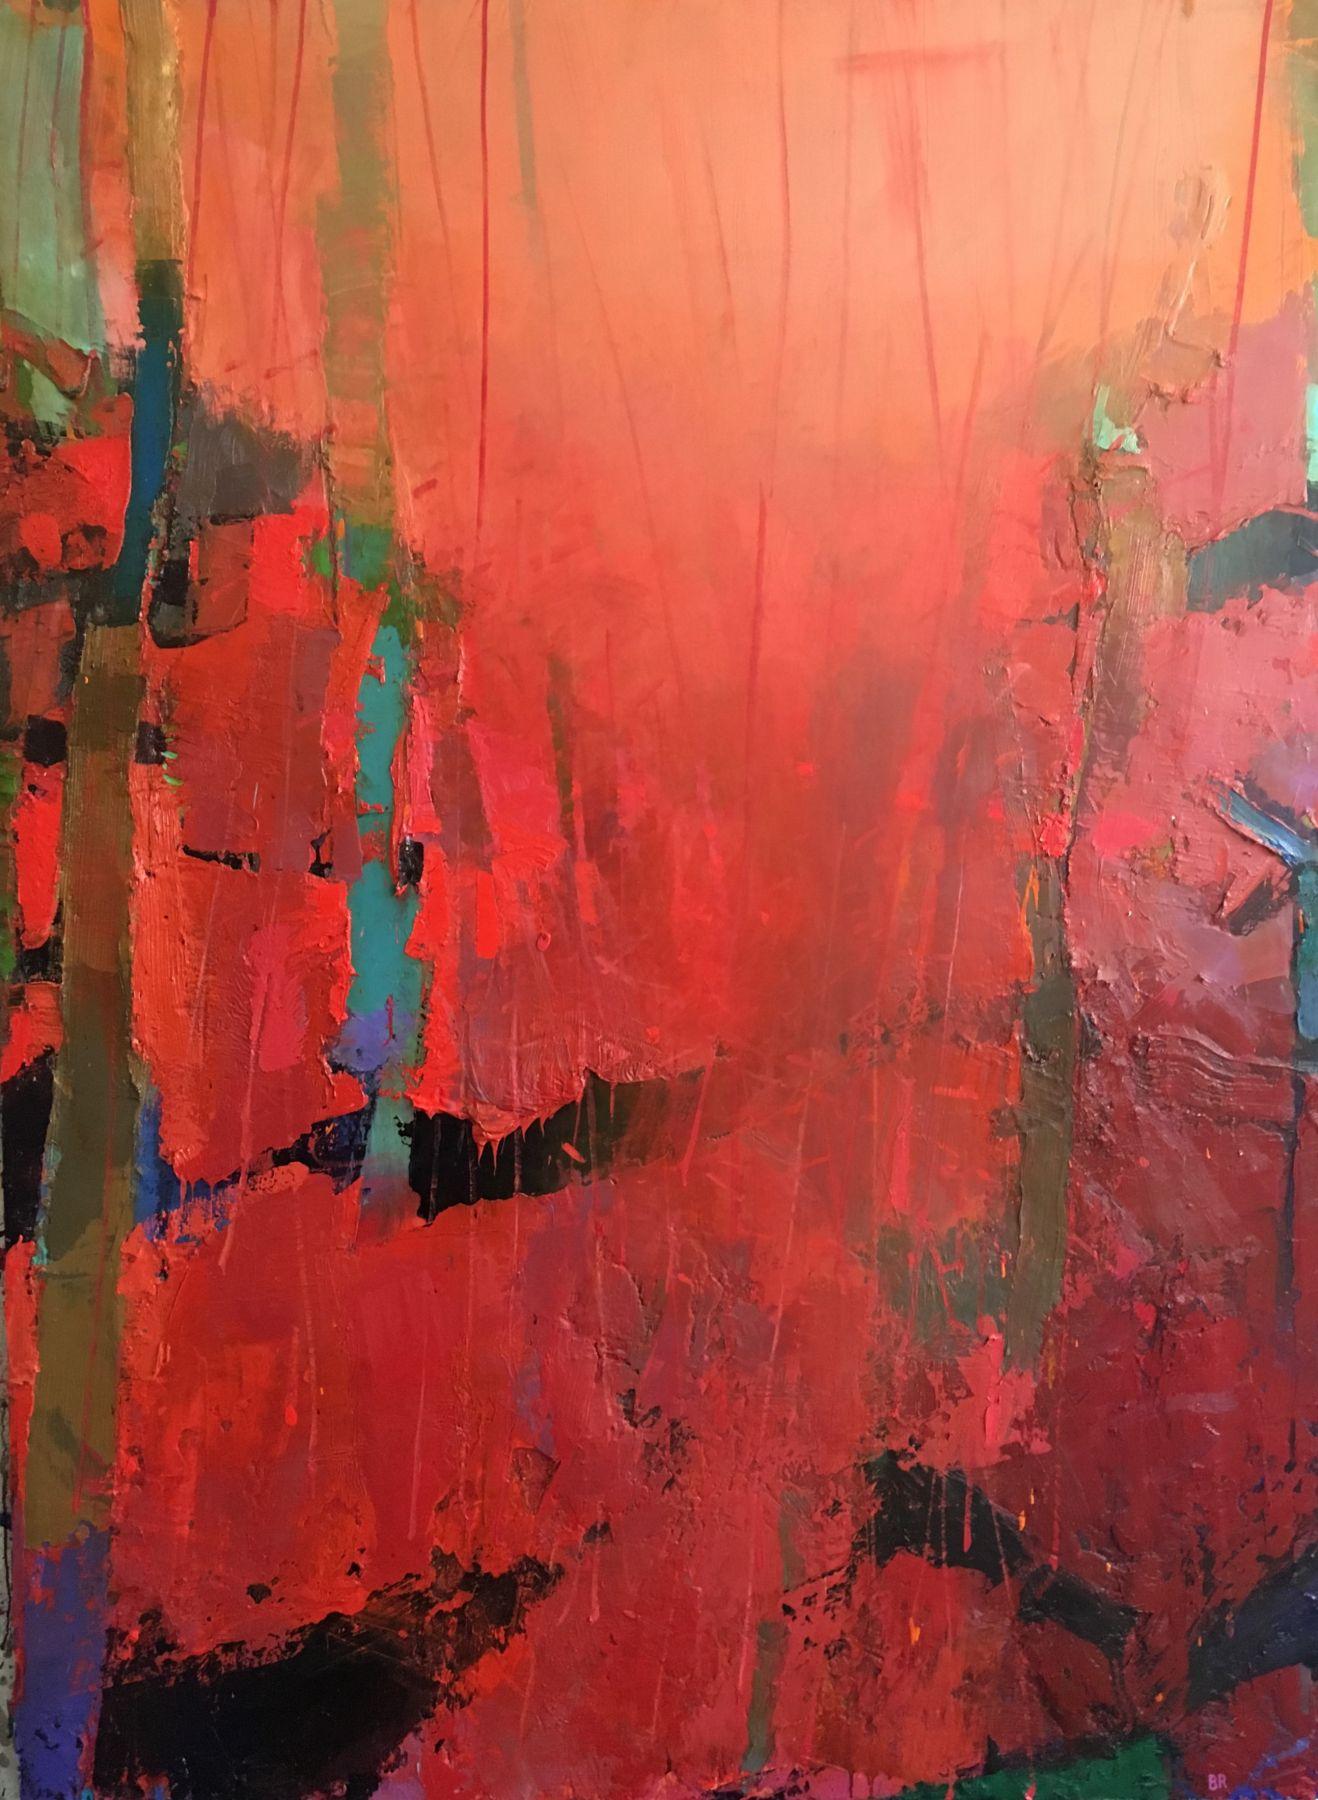 Brian Rutenberg, Lever (SOLD), 2016, oil on linen, 82 x 60 inches